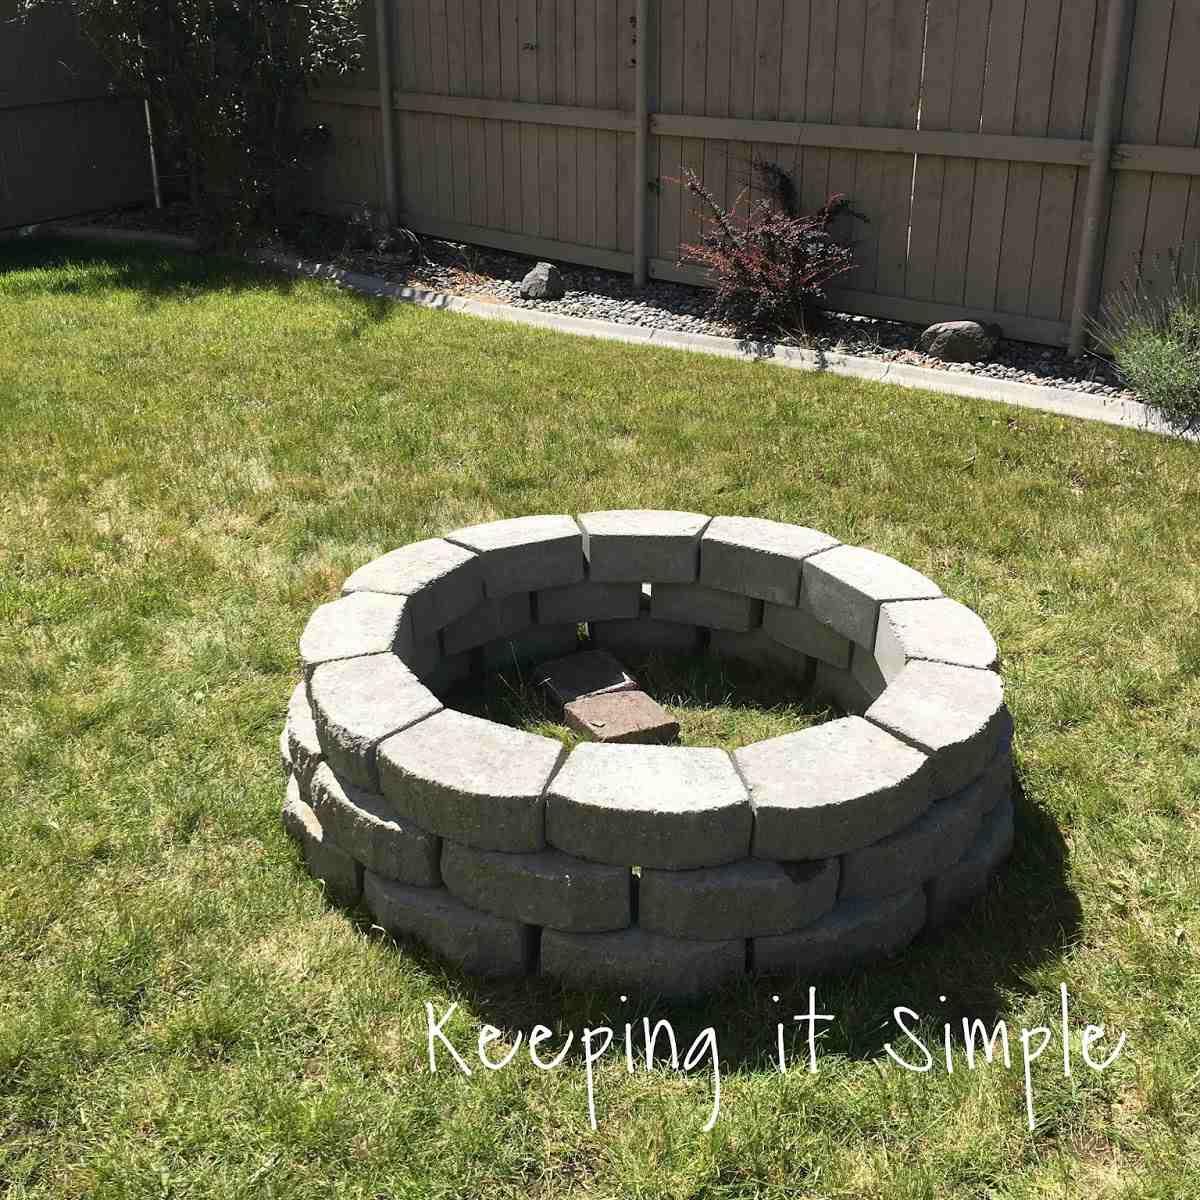 A stone fire pit in a backyard